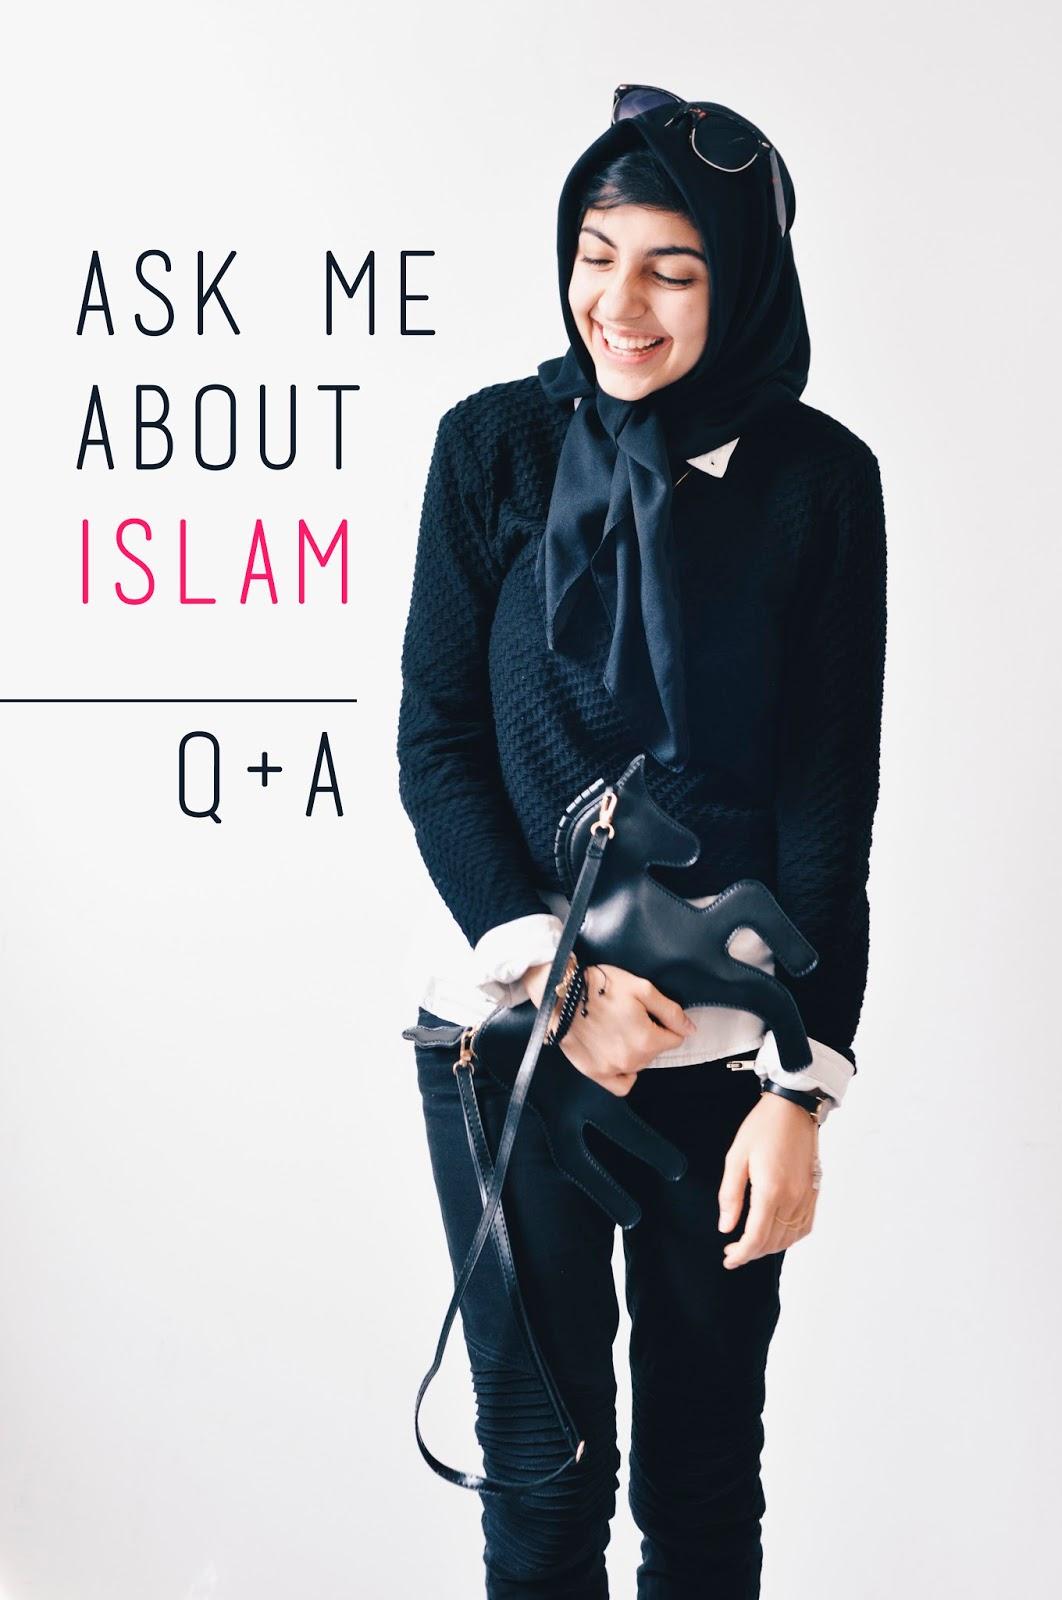 Islam, Muslims, ISIS, Islam Q&A, Paris Attacks, Paris terrorism, Islam fashion